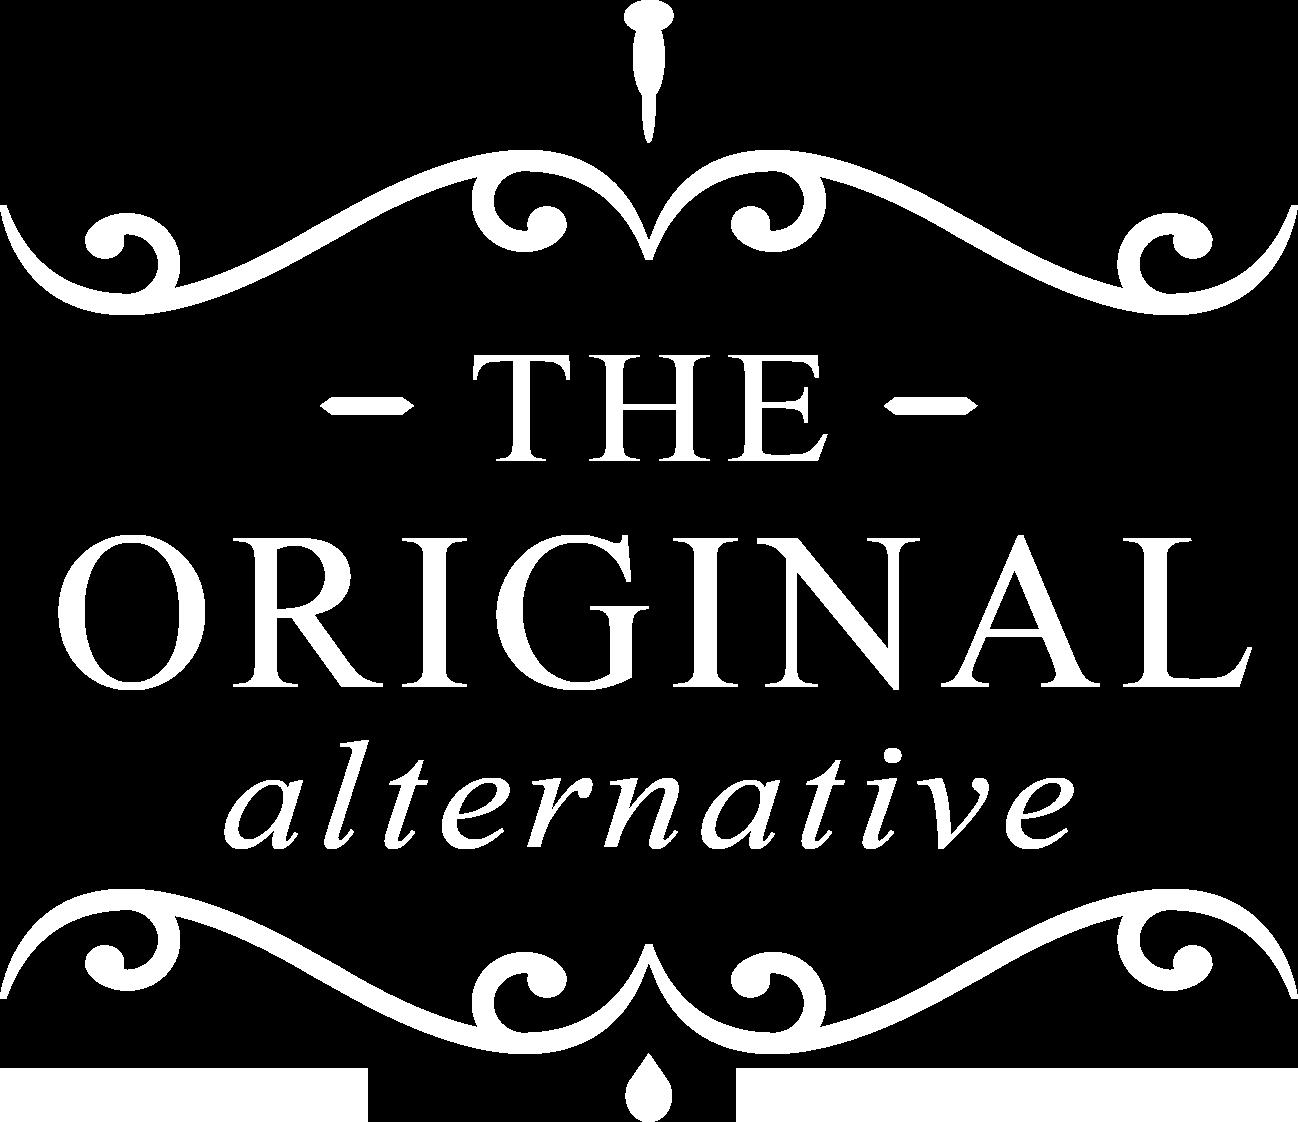 The Original Alternative Guernsey